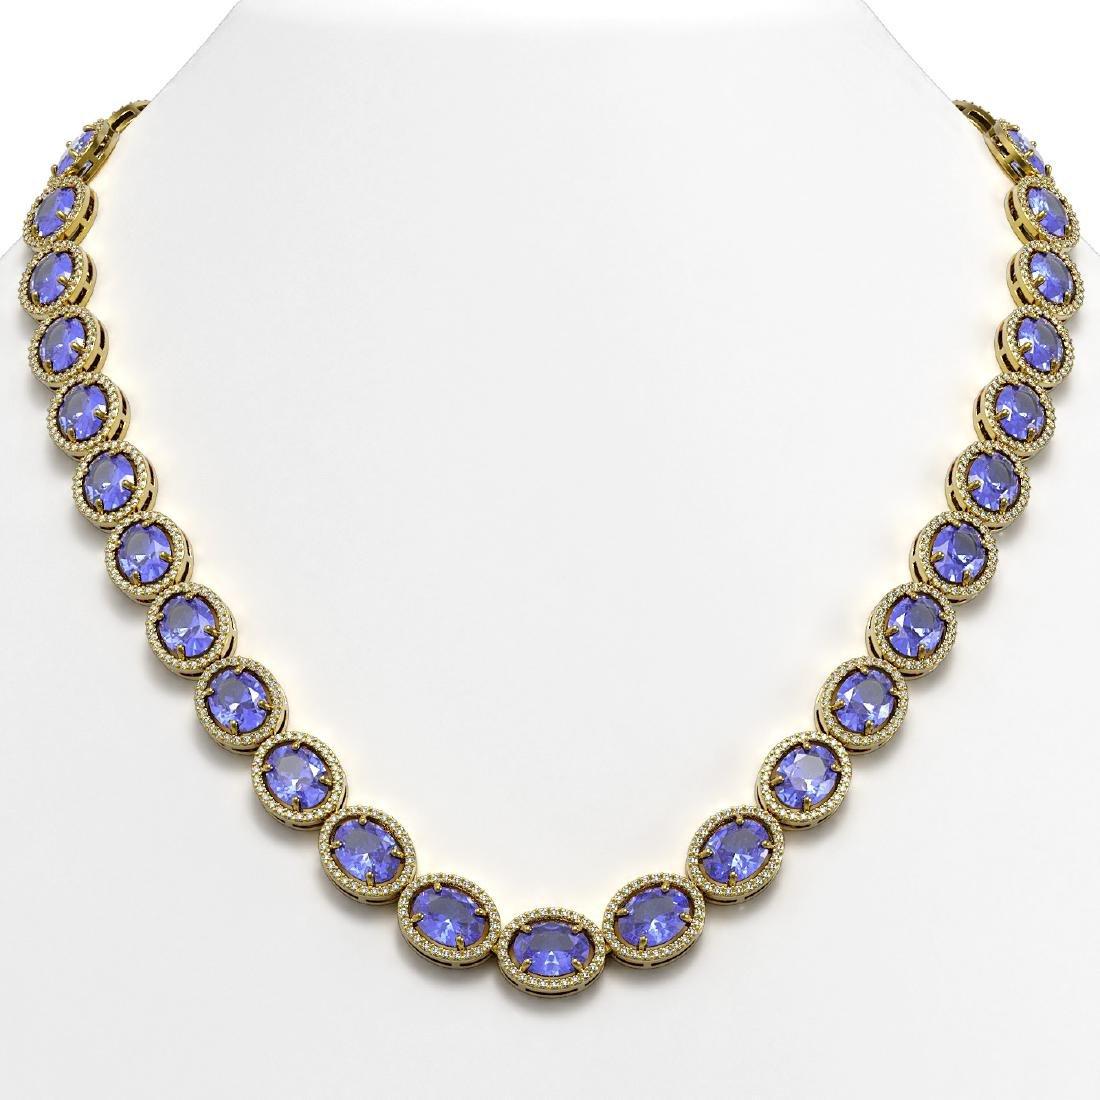 62.99 CTW Tanzanite & Diamond Halo Necklace 10K Yellow